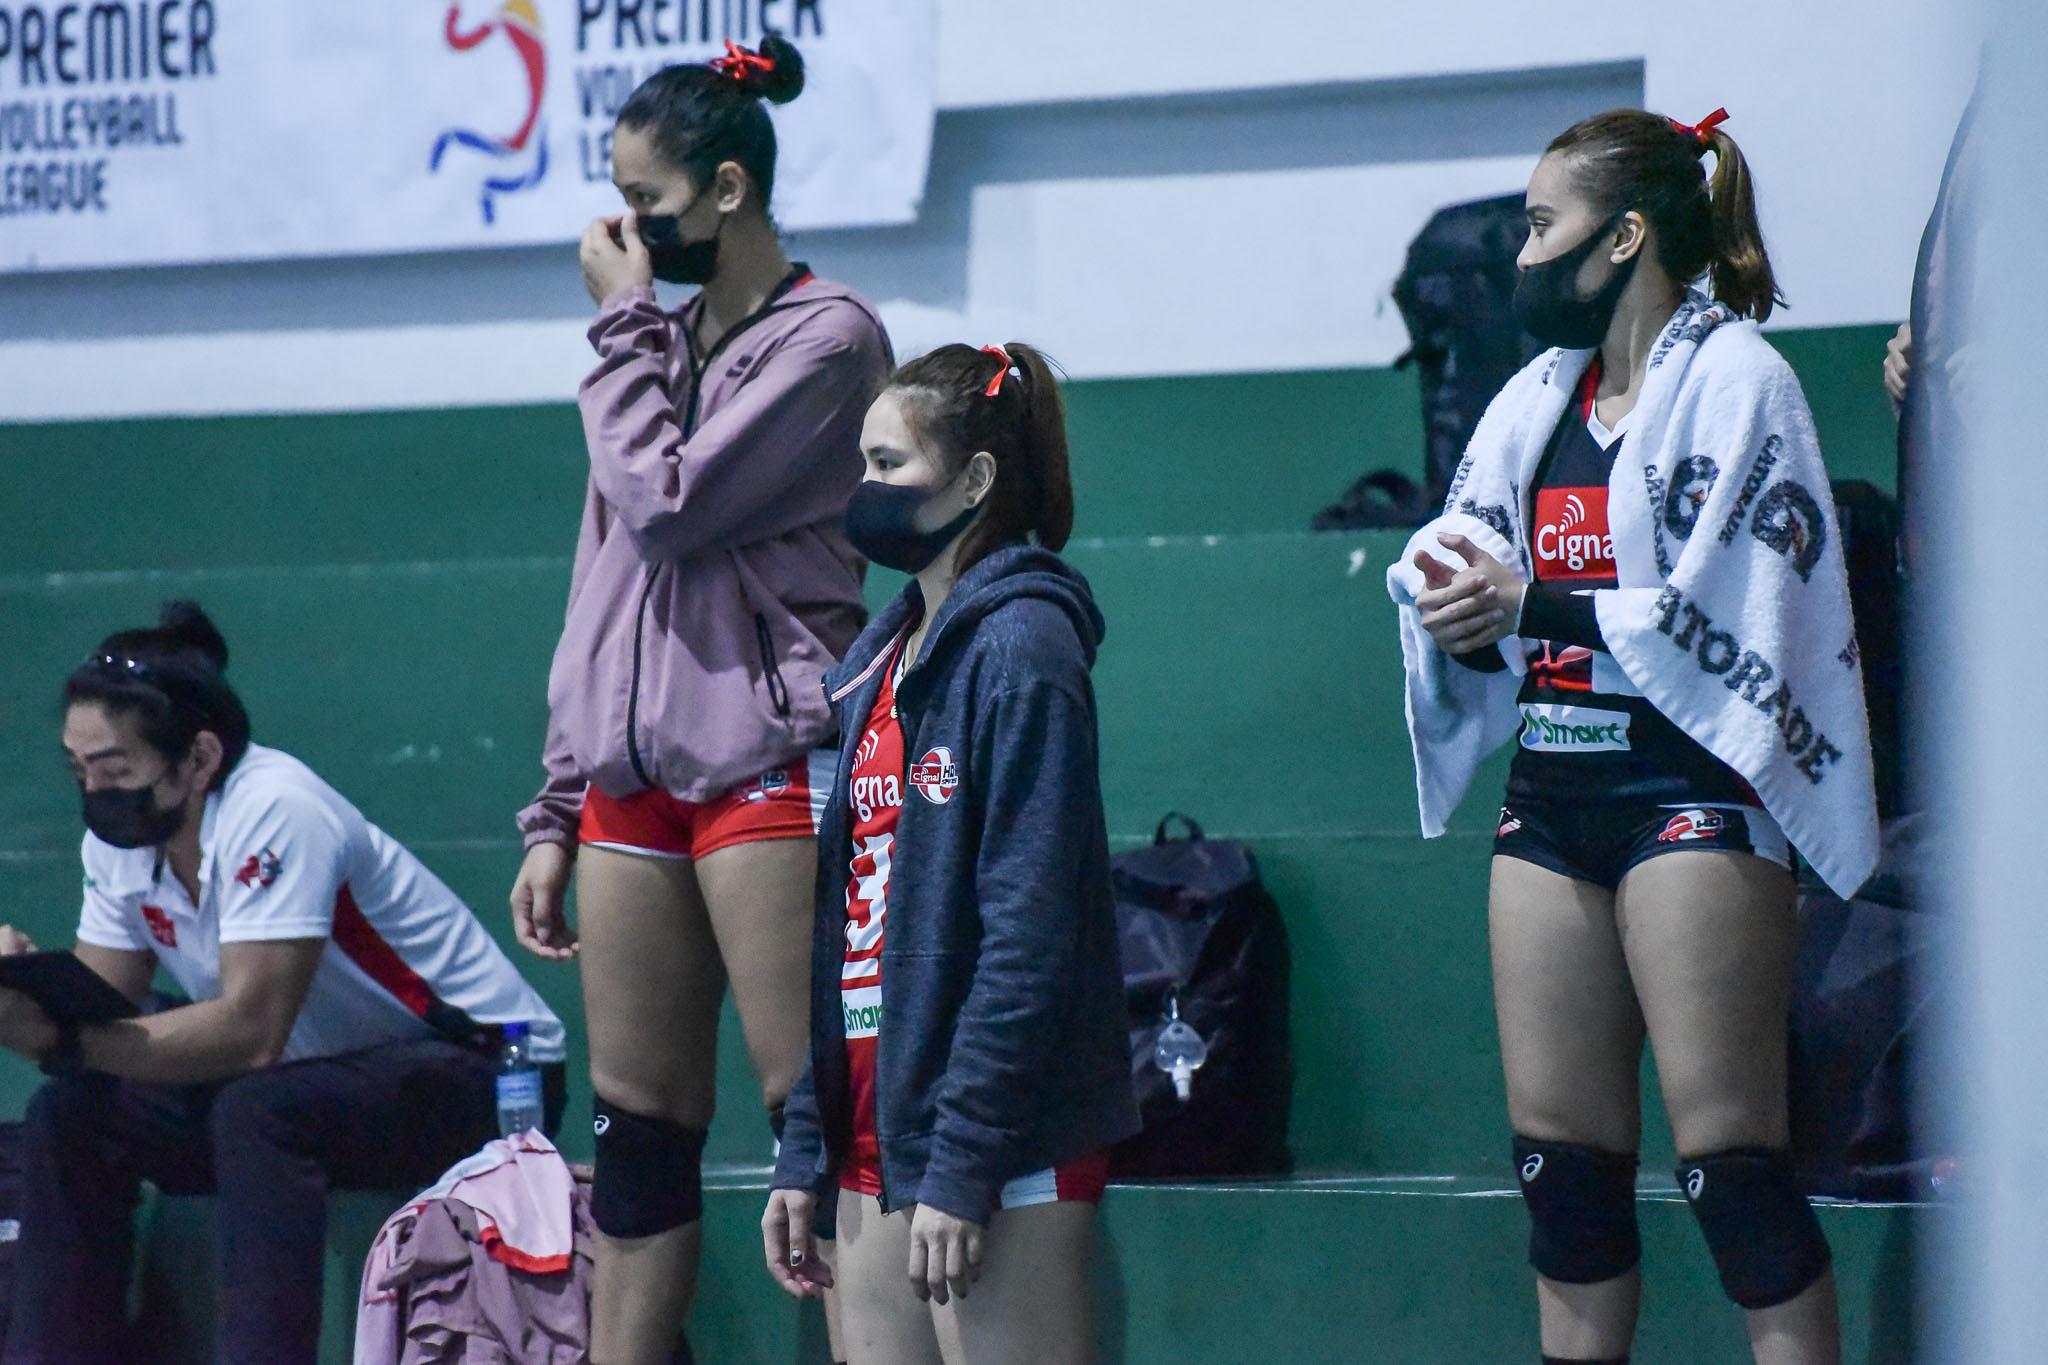 2021-PVL-Open-Cignal-vs.-Creamline-Rachel-Anne-Daquis-5649 Creamline scores hard fought sweep of Cignal for bounce back PVL win News PVL Volleyball  - philippine sports news